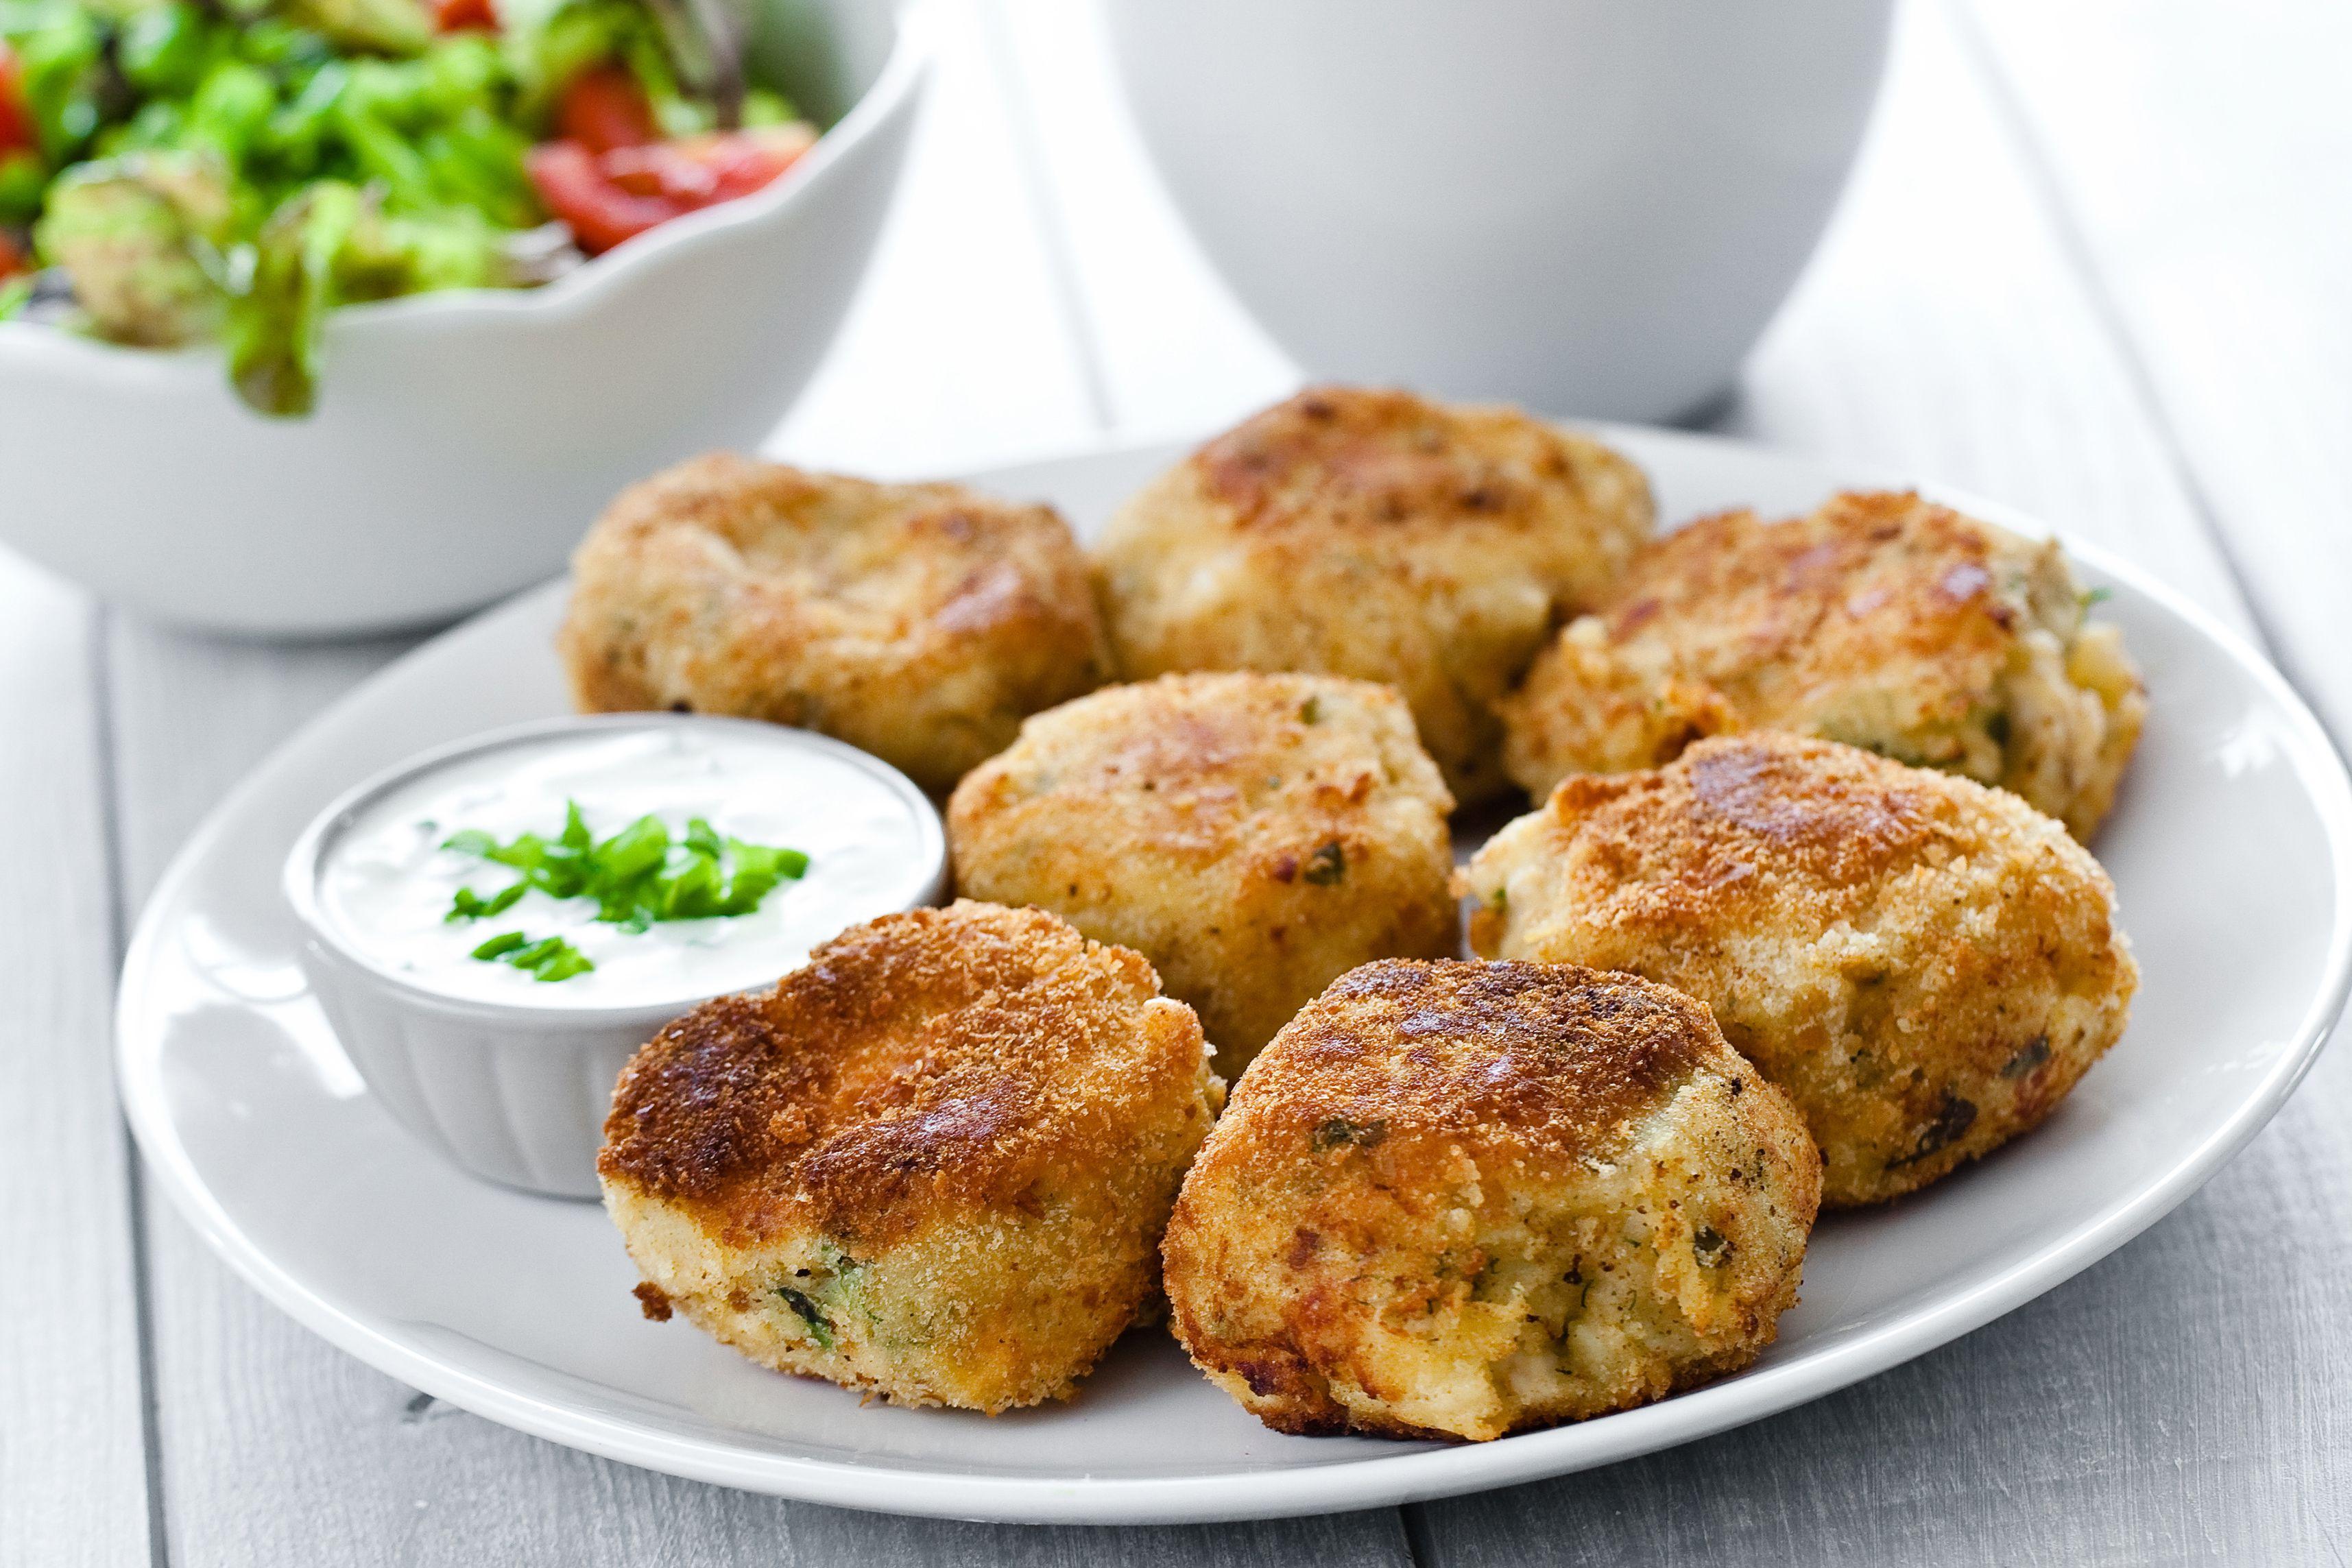 Mashed Potato and Ham Patties